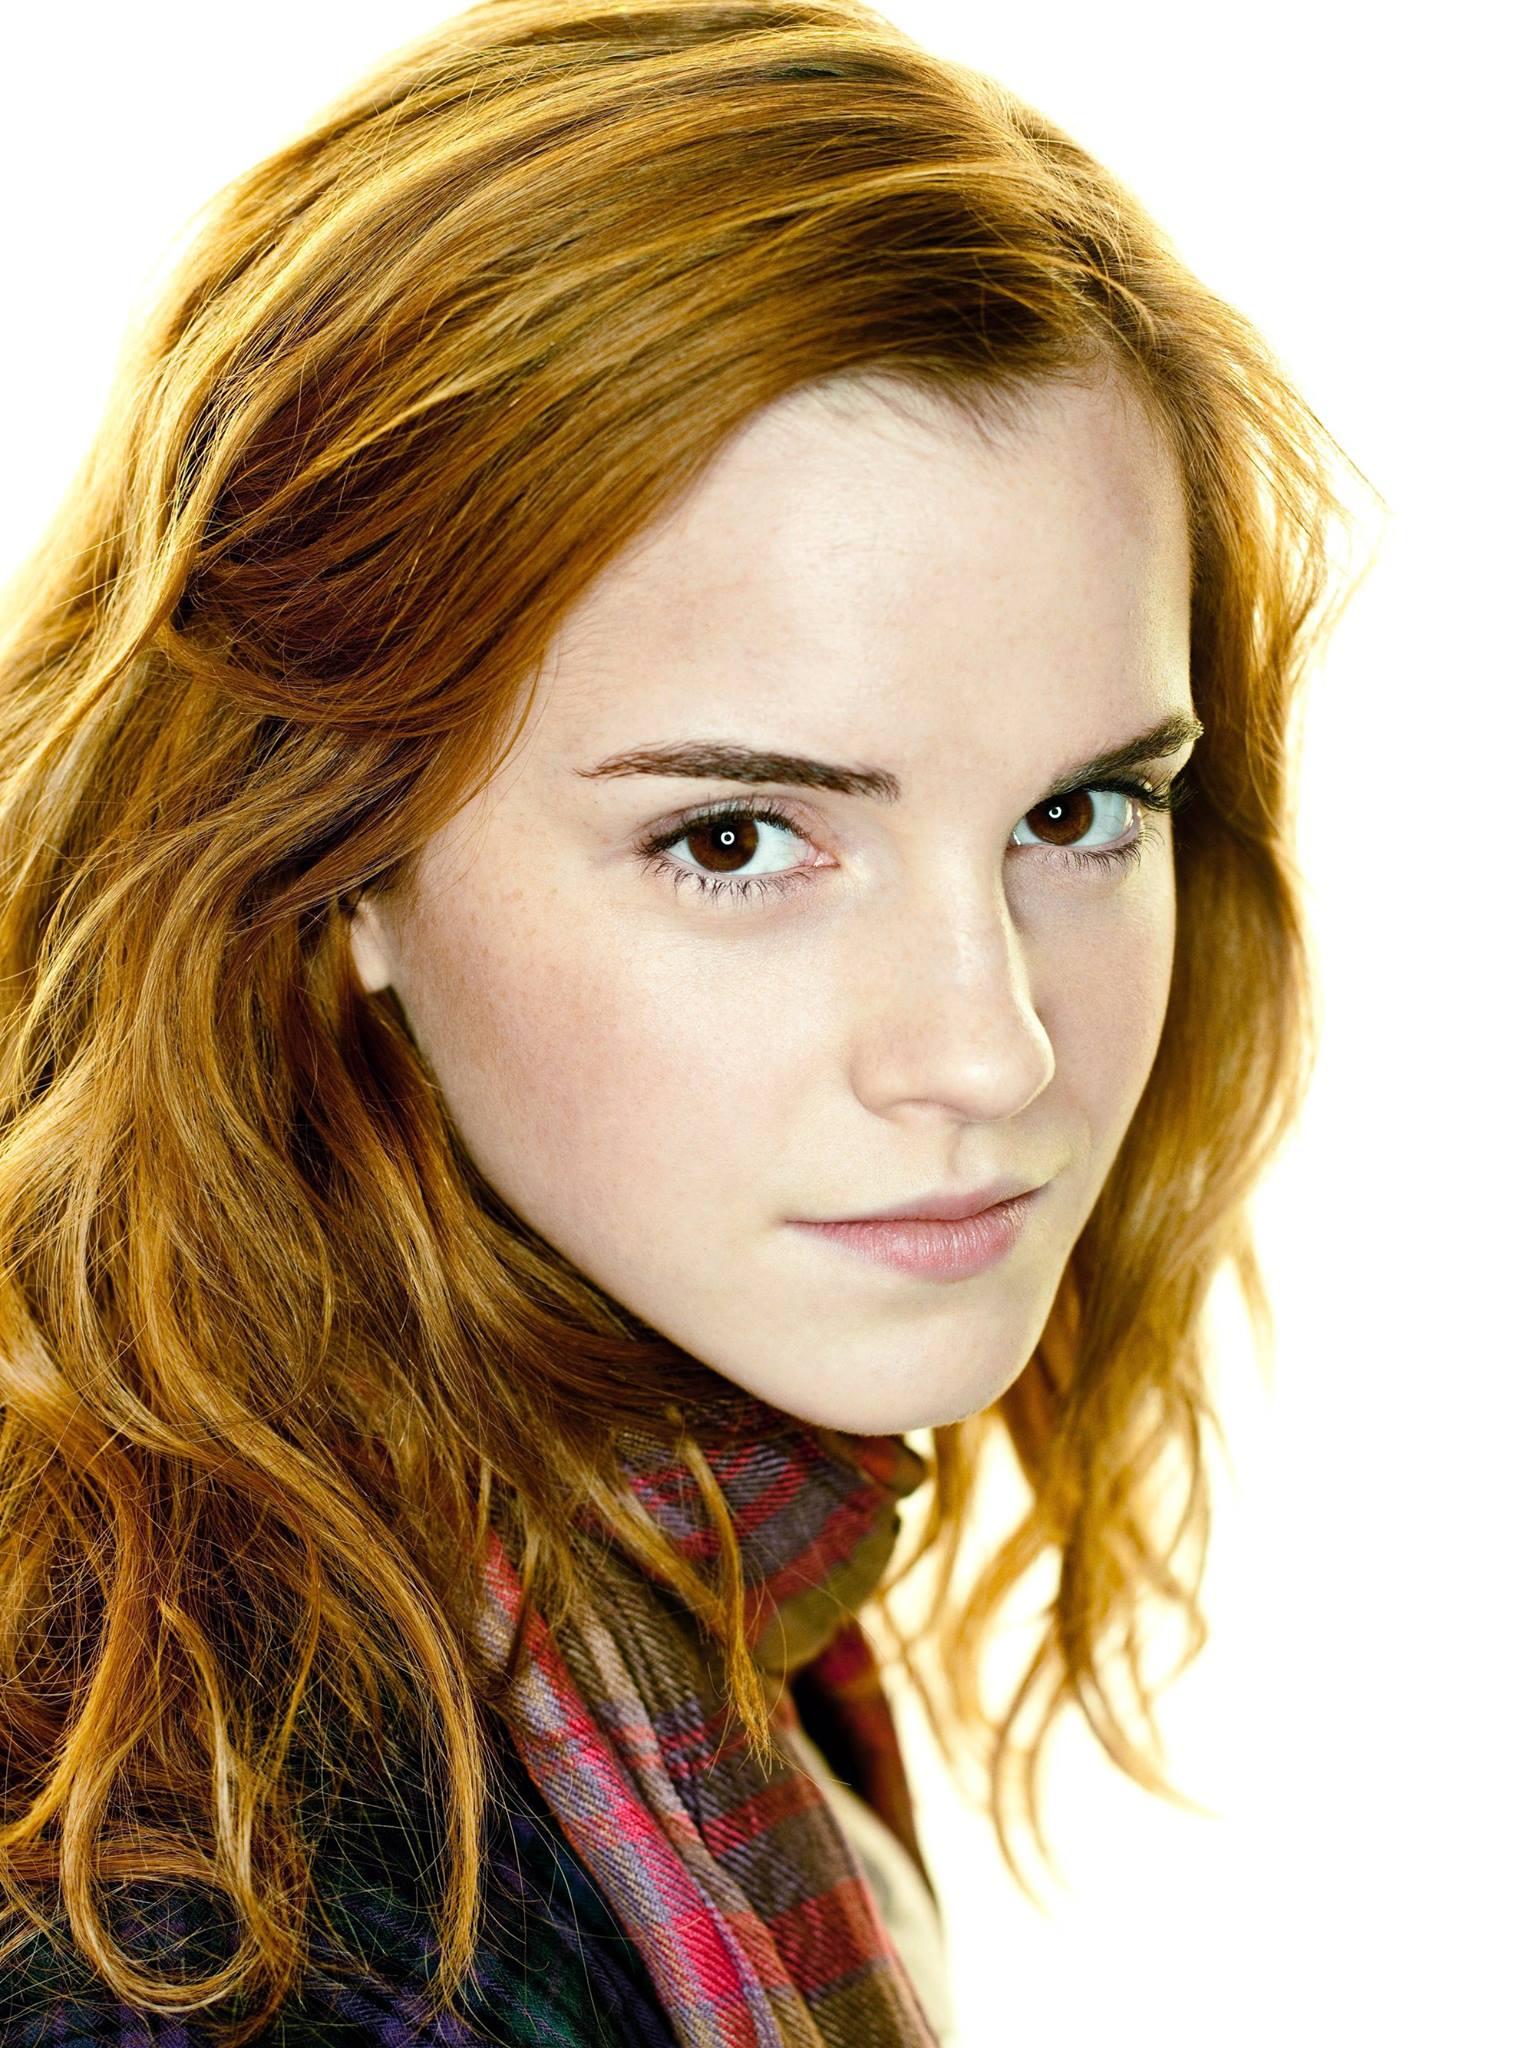 Hermione Granger  Harry Potter Wiki  Fandom Powered By Wikia-8176